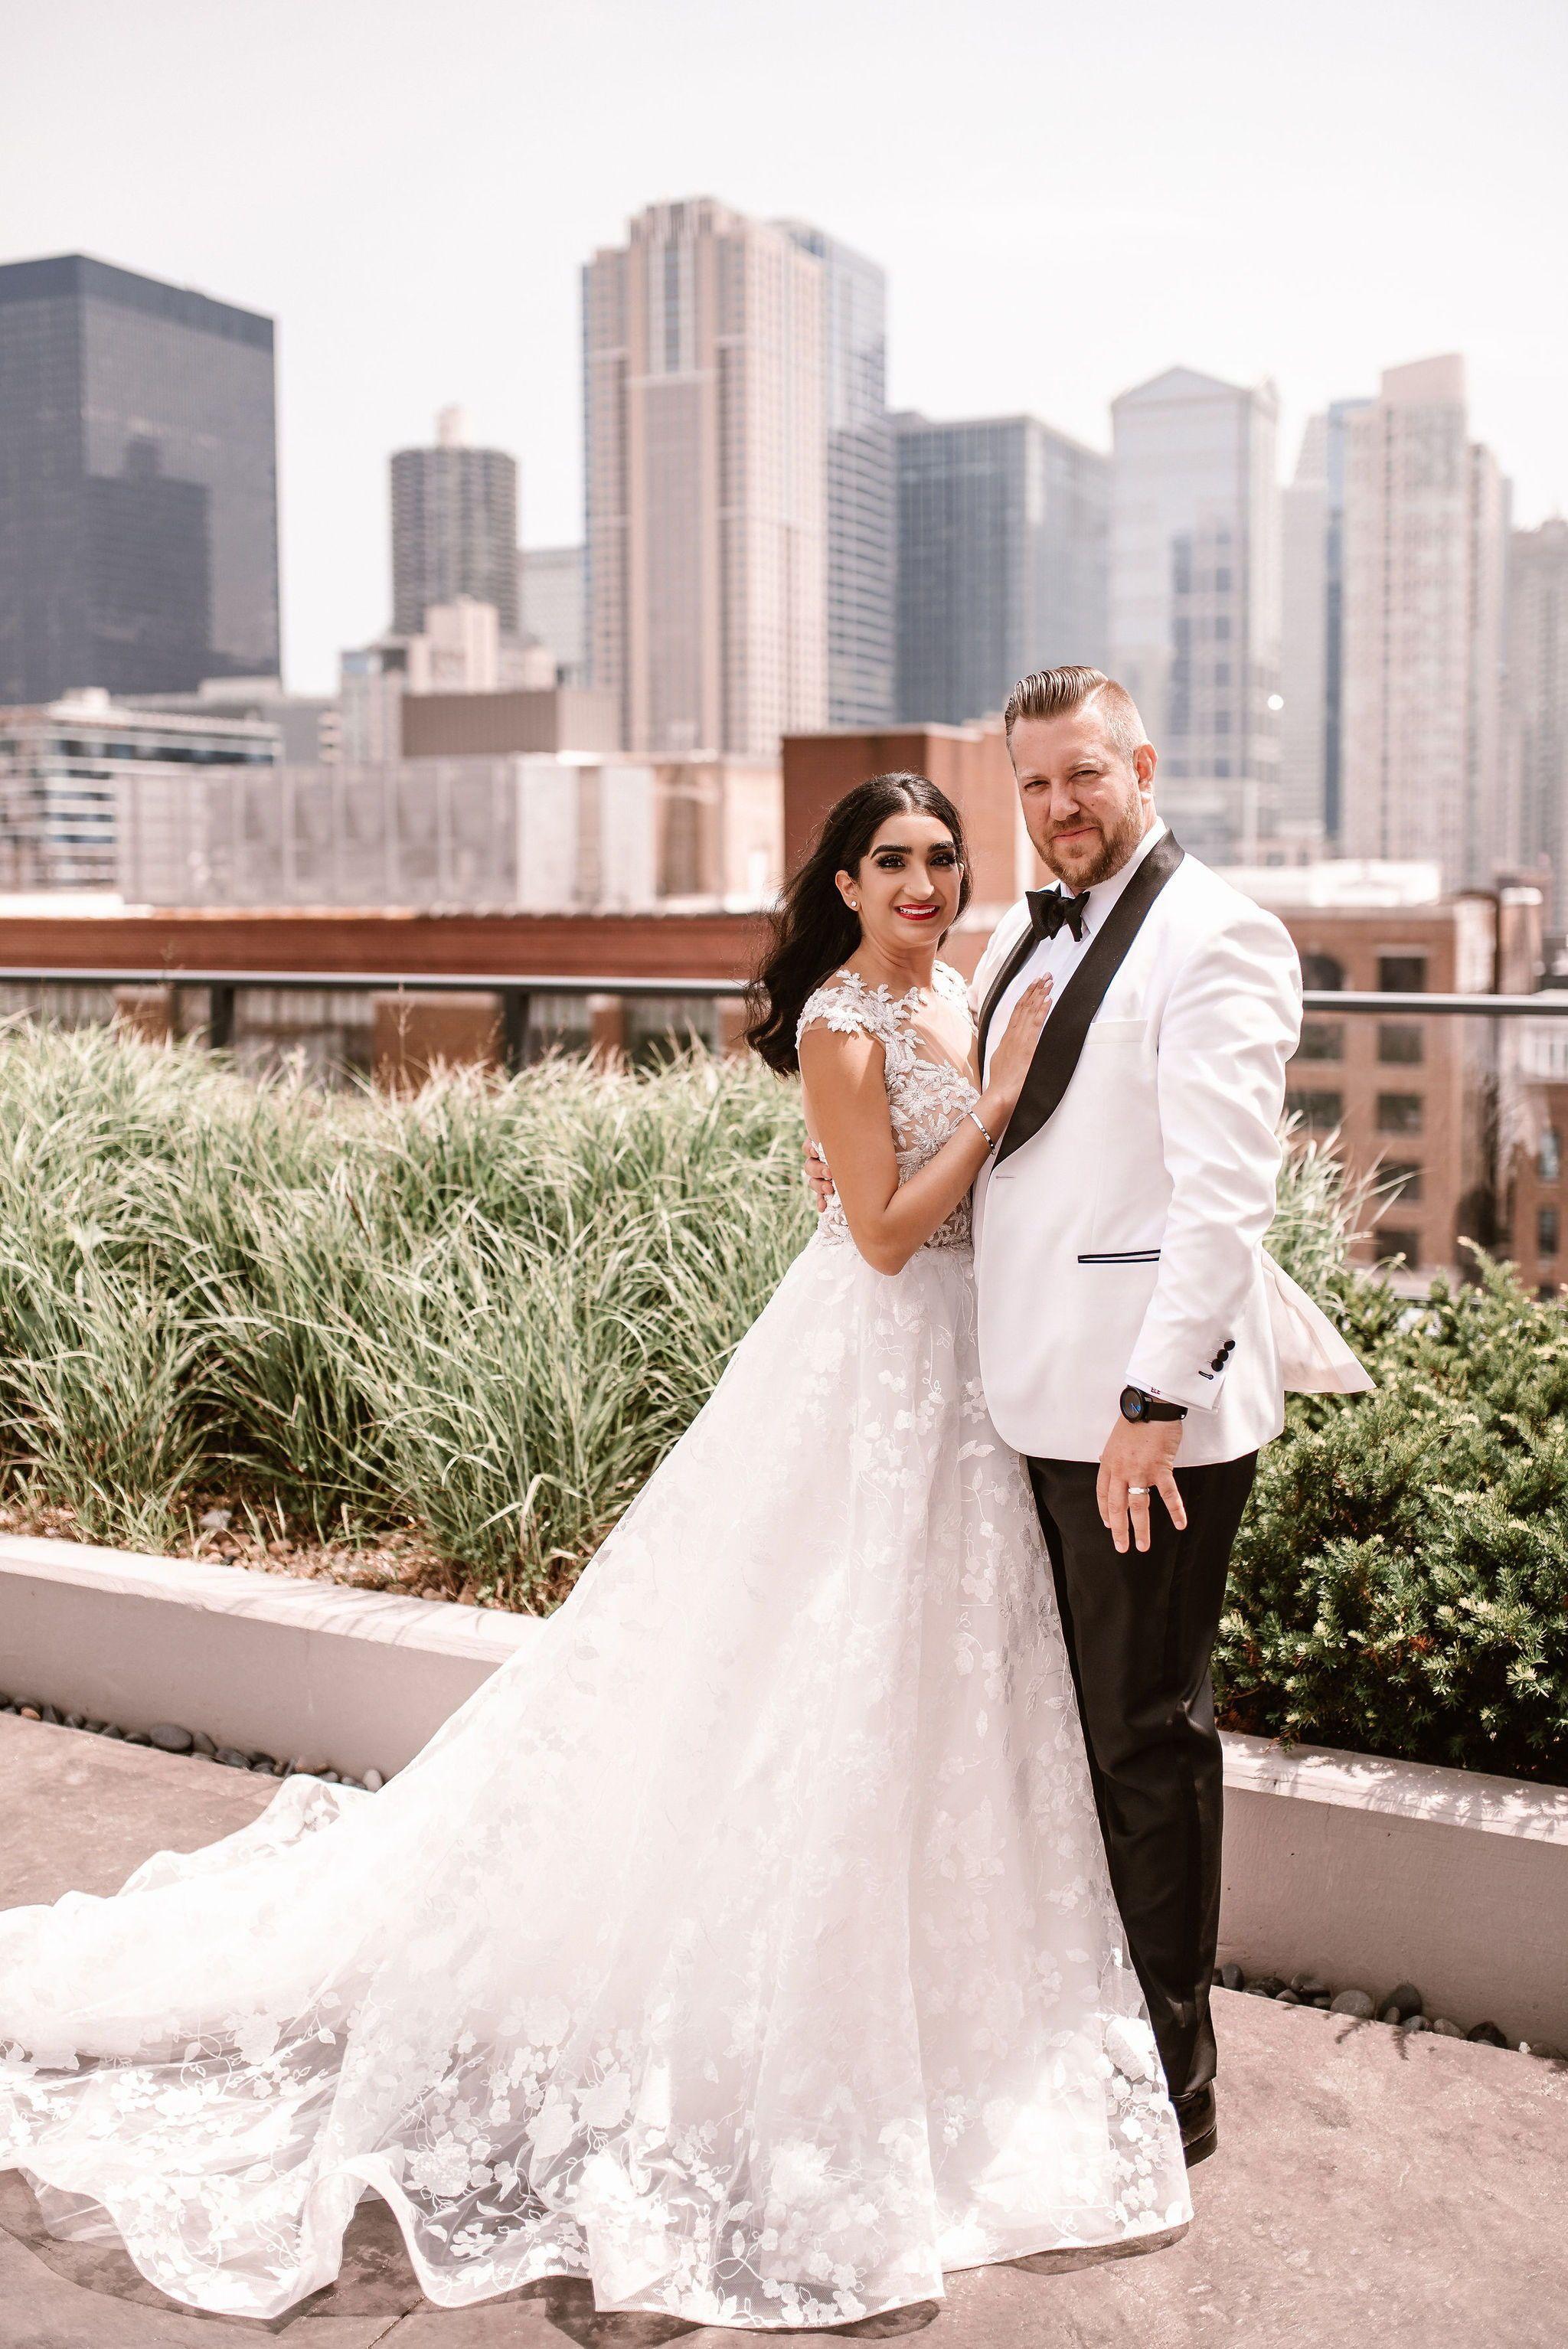 Intimate Loft Lucia Wedding Chicago Wedding Photographer In 2020 Downtown Wedding Chicago Wedding Venues Chicago Wedding